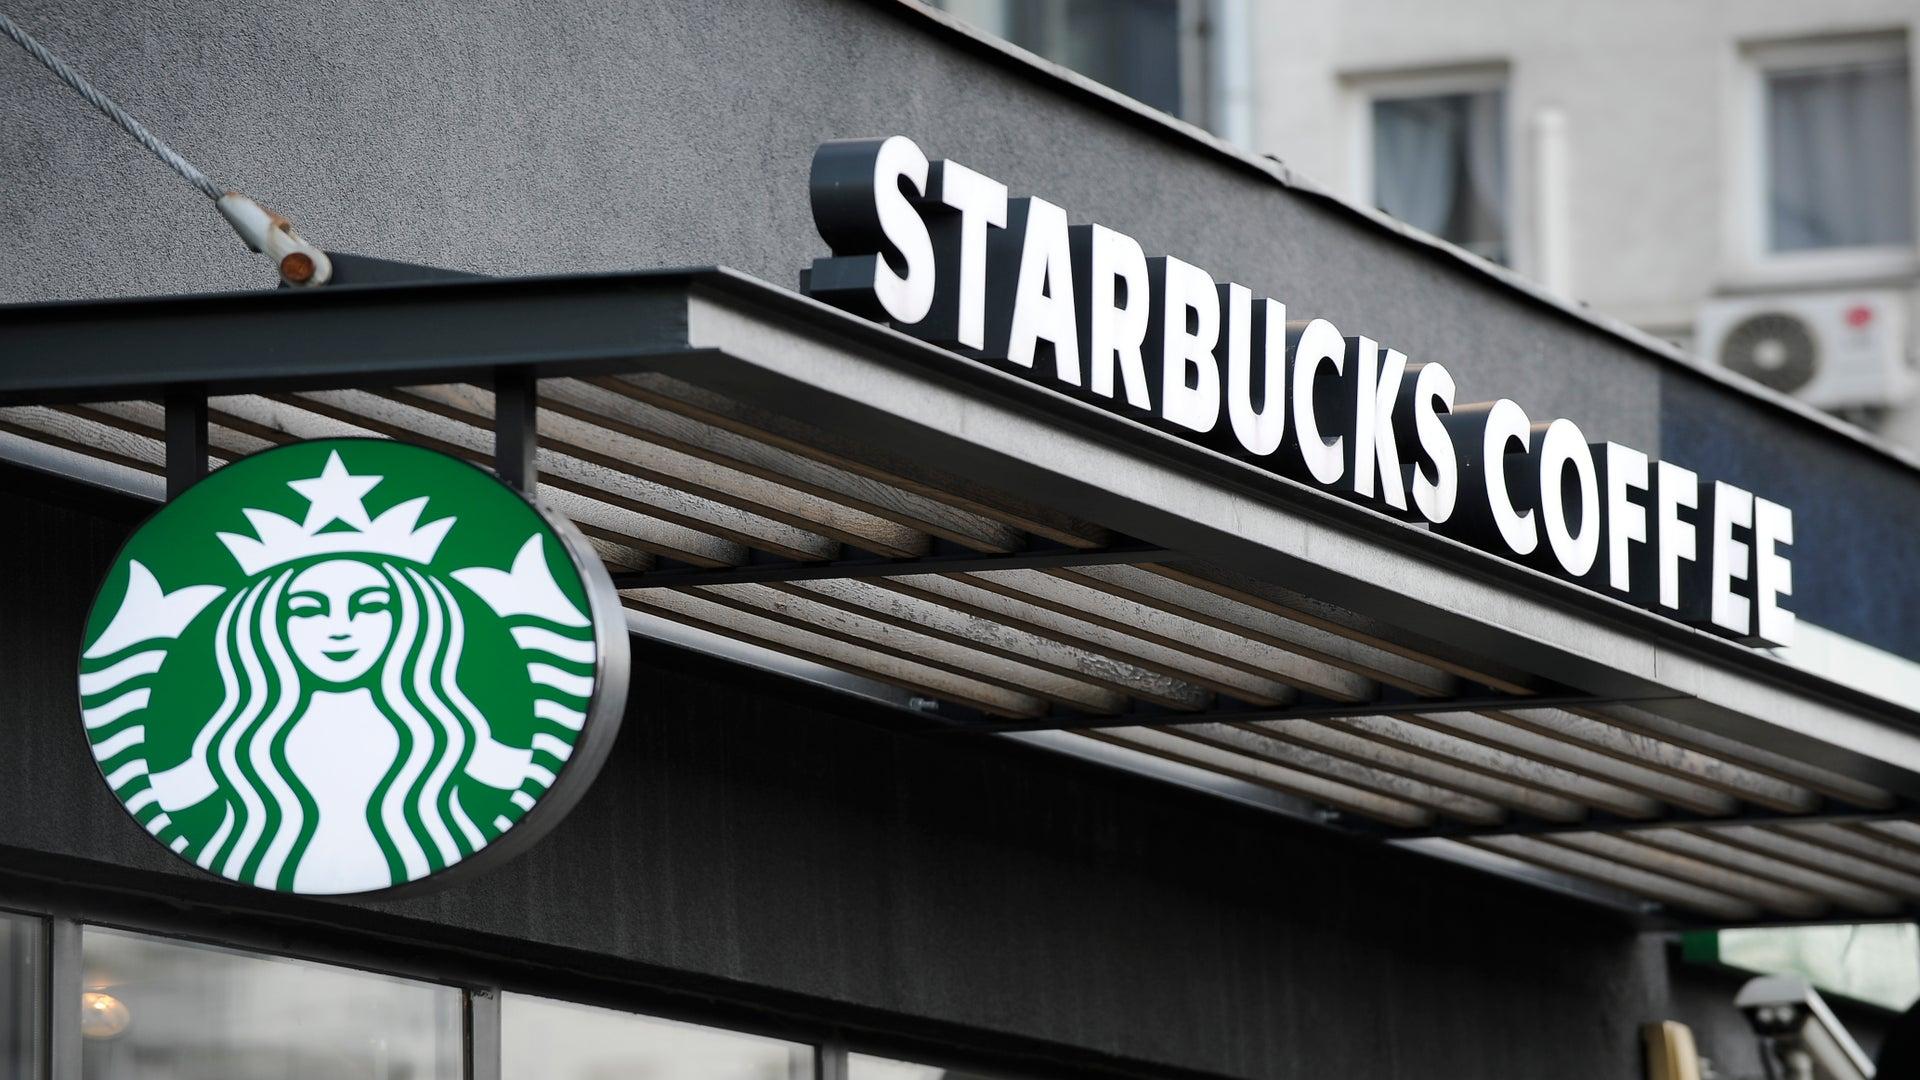 Starbucks CEO Apologizes For Racist Arrest Of Two Black Men At Philadelphia Store